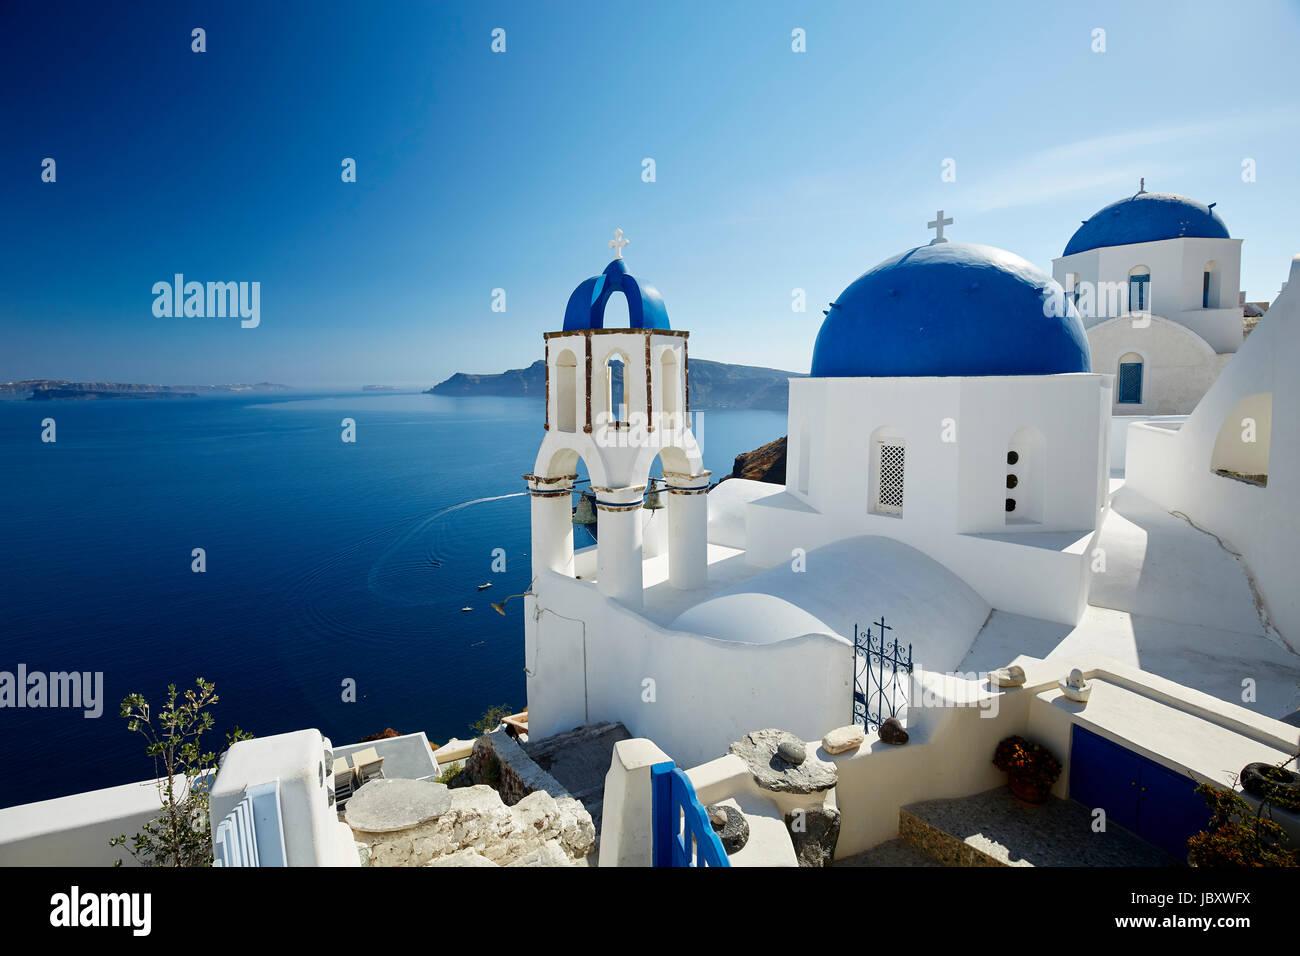 Churches overlooking Oia, Santorini - Stock Image